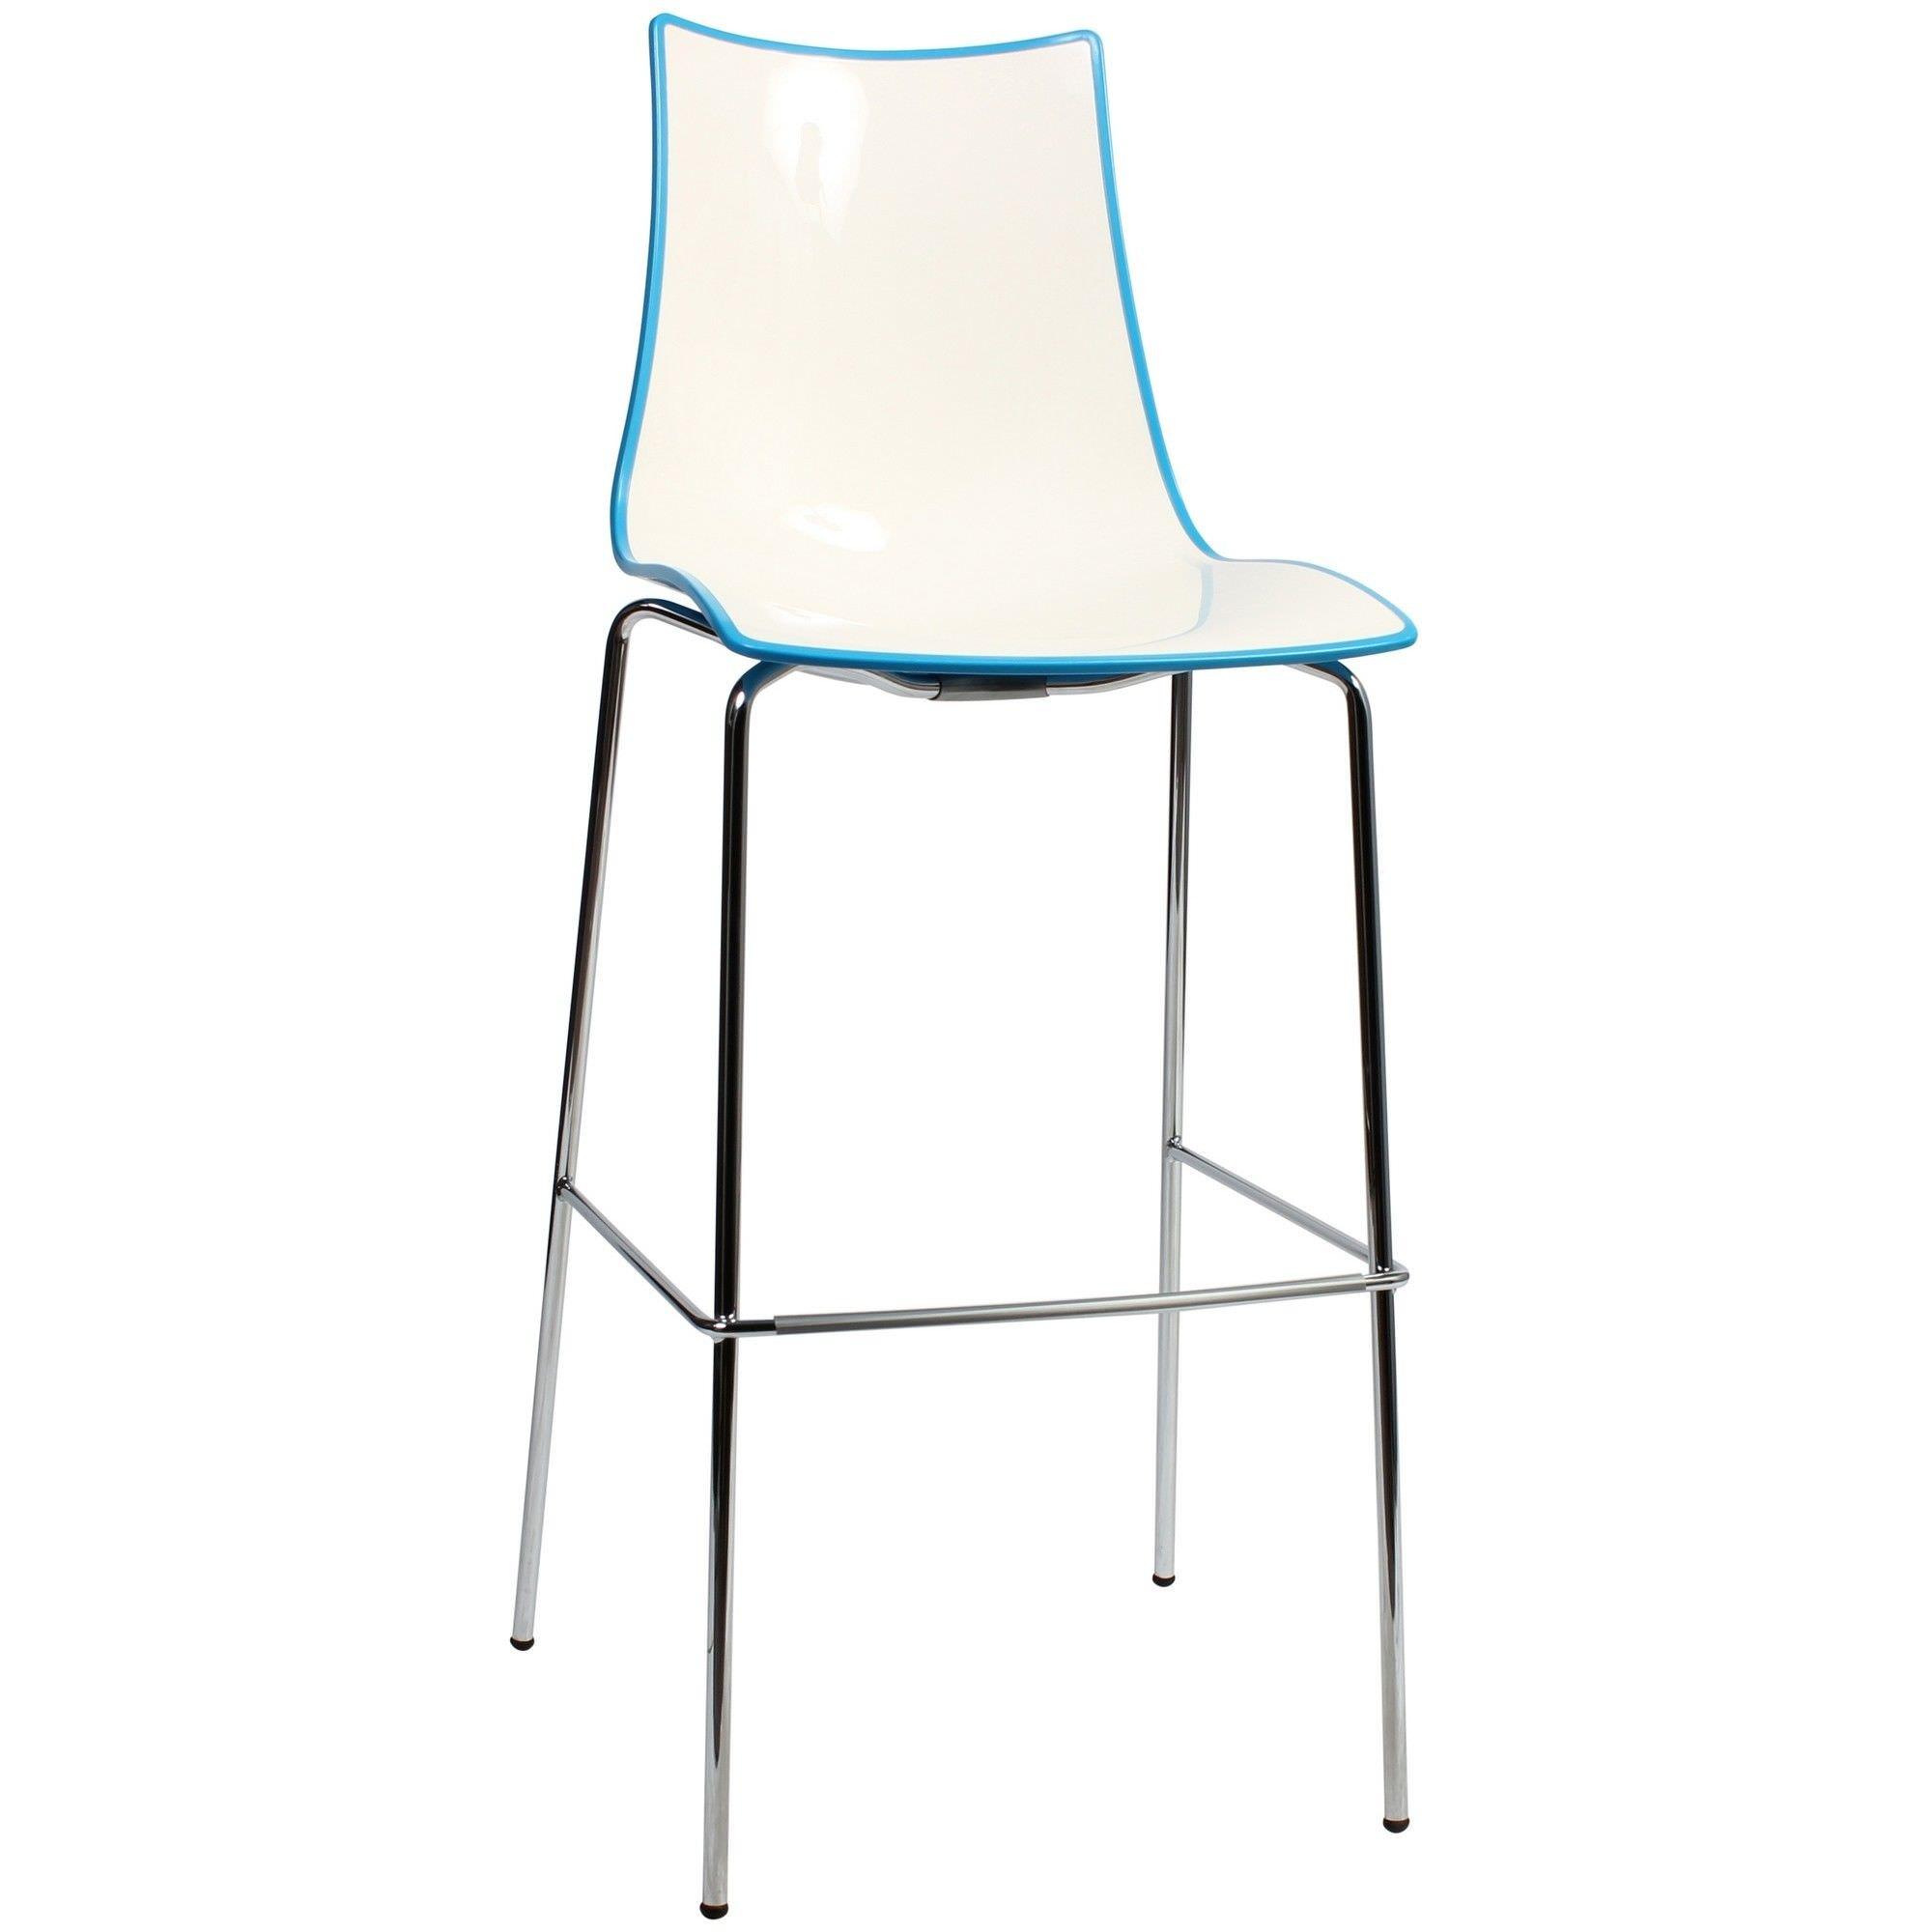 Zebra Bicolore Italian Made Commercial Grade Bar Stool, Metal Leg, Blue / Chrome